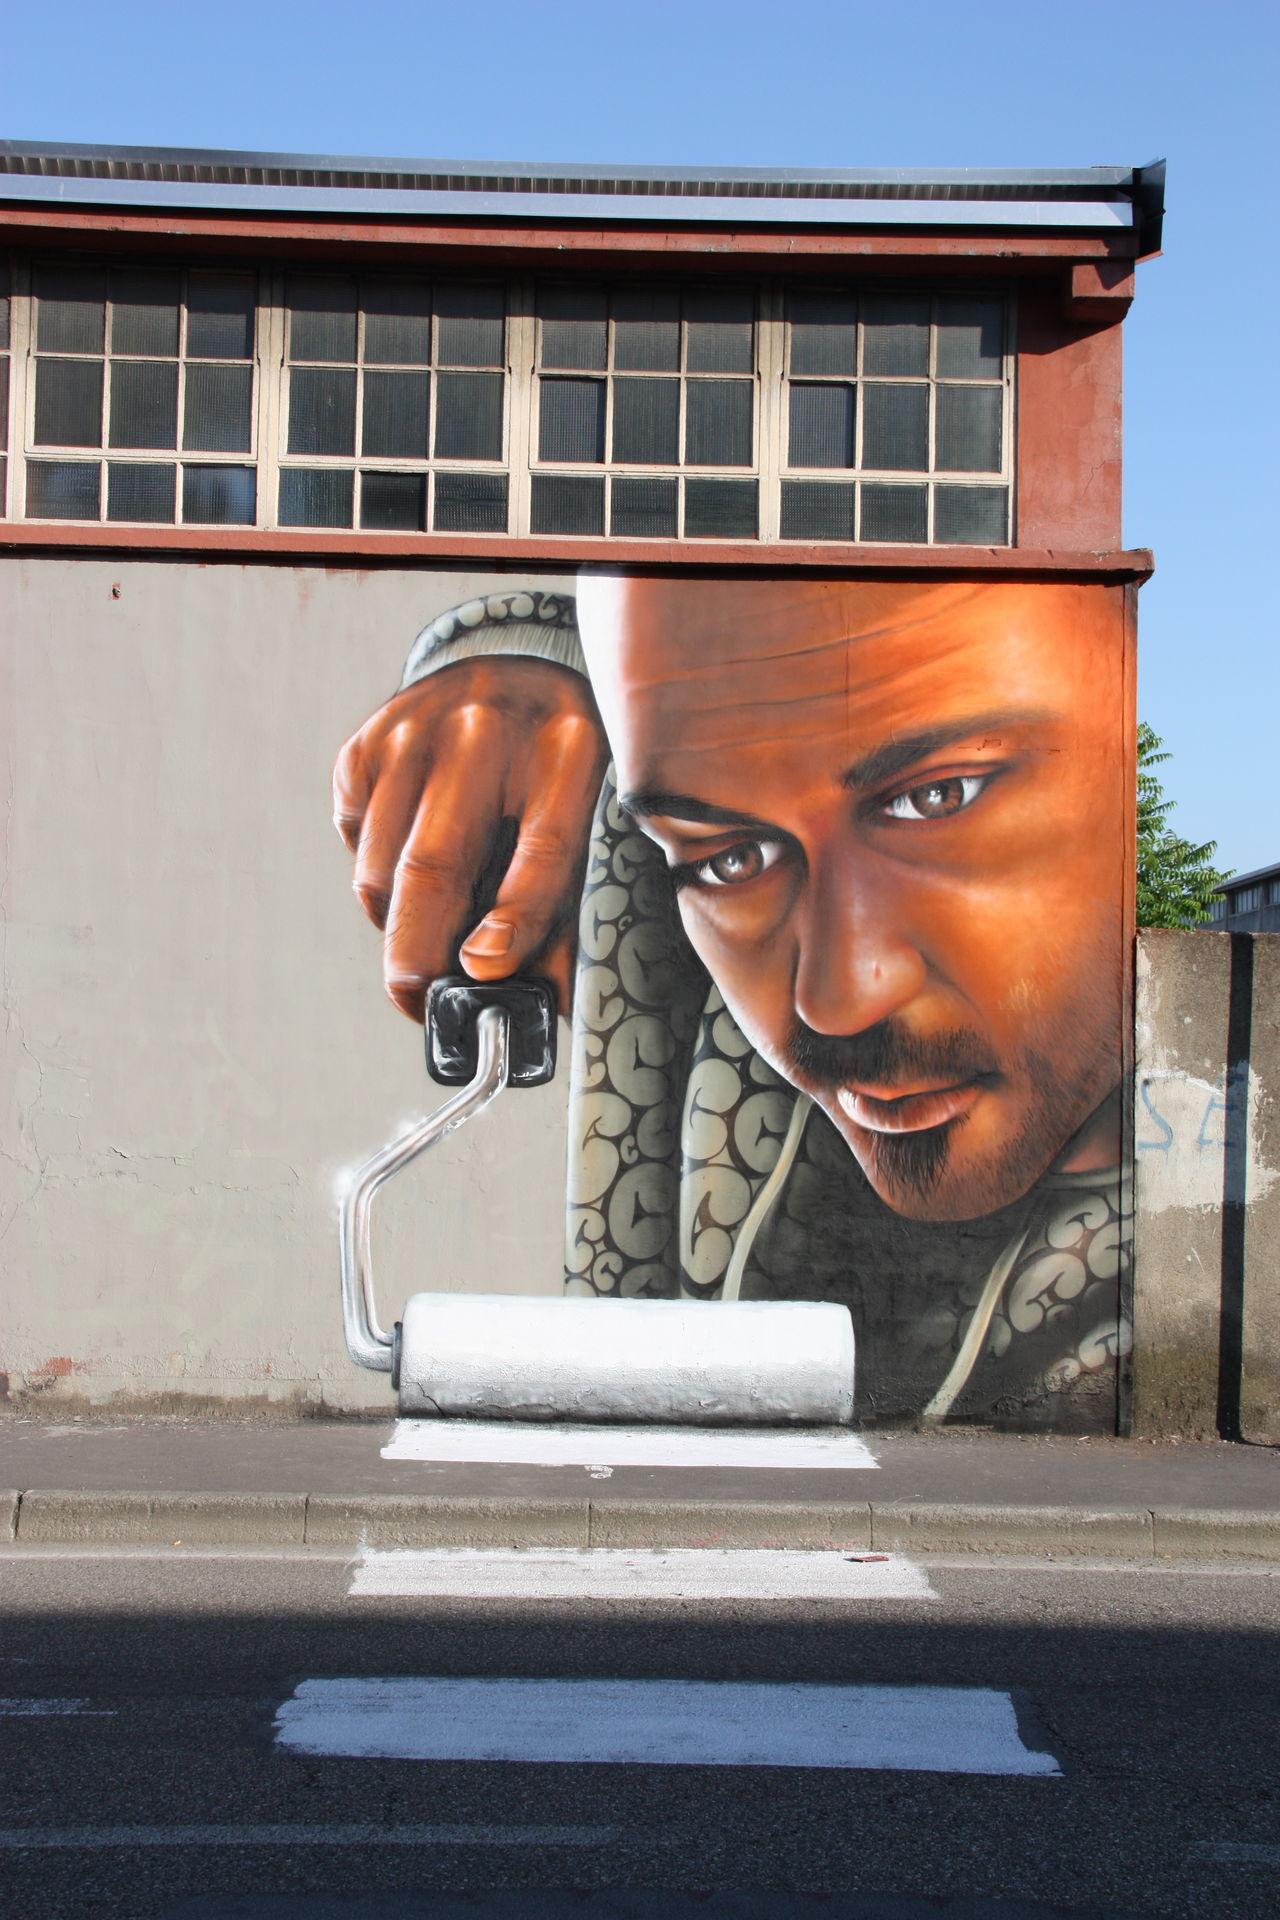 Street art/Graffiti Colors Graffiti Art Murales Muralesart Outdoors RePicture Growth Showcase: December Street Art/Graffiti Street Photography Art Is Everywhere Cut And Paste Mos2015